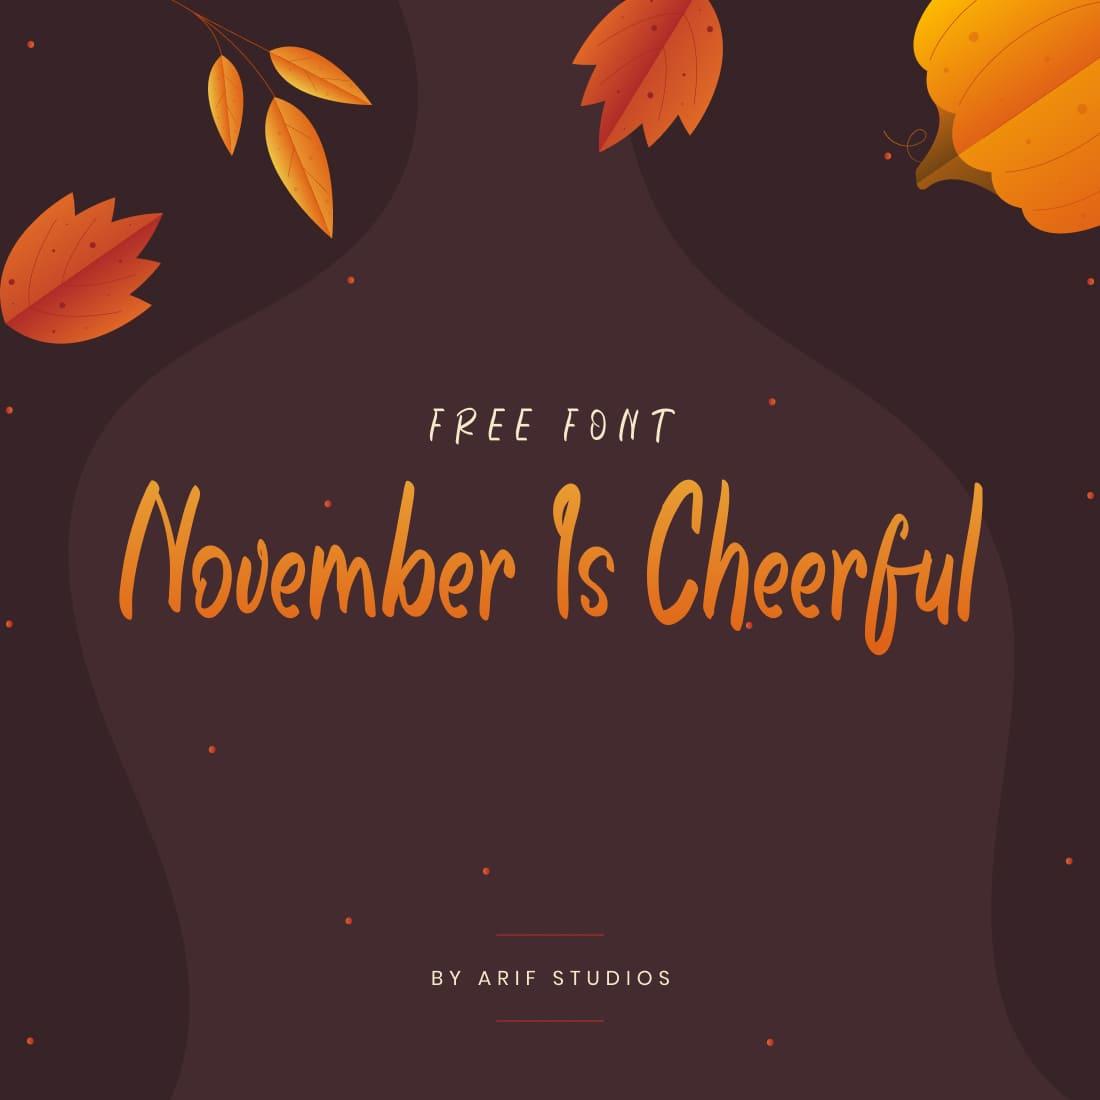 MasterBundles Free Font November Is Cheerful Main Collage Image.